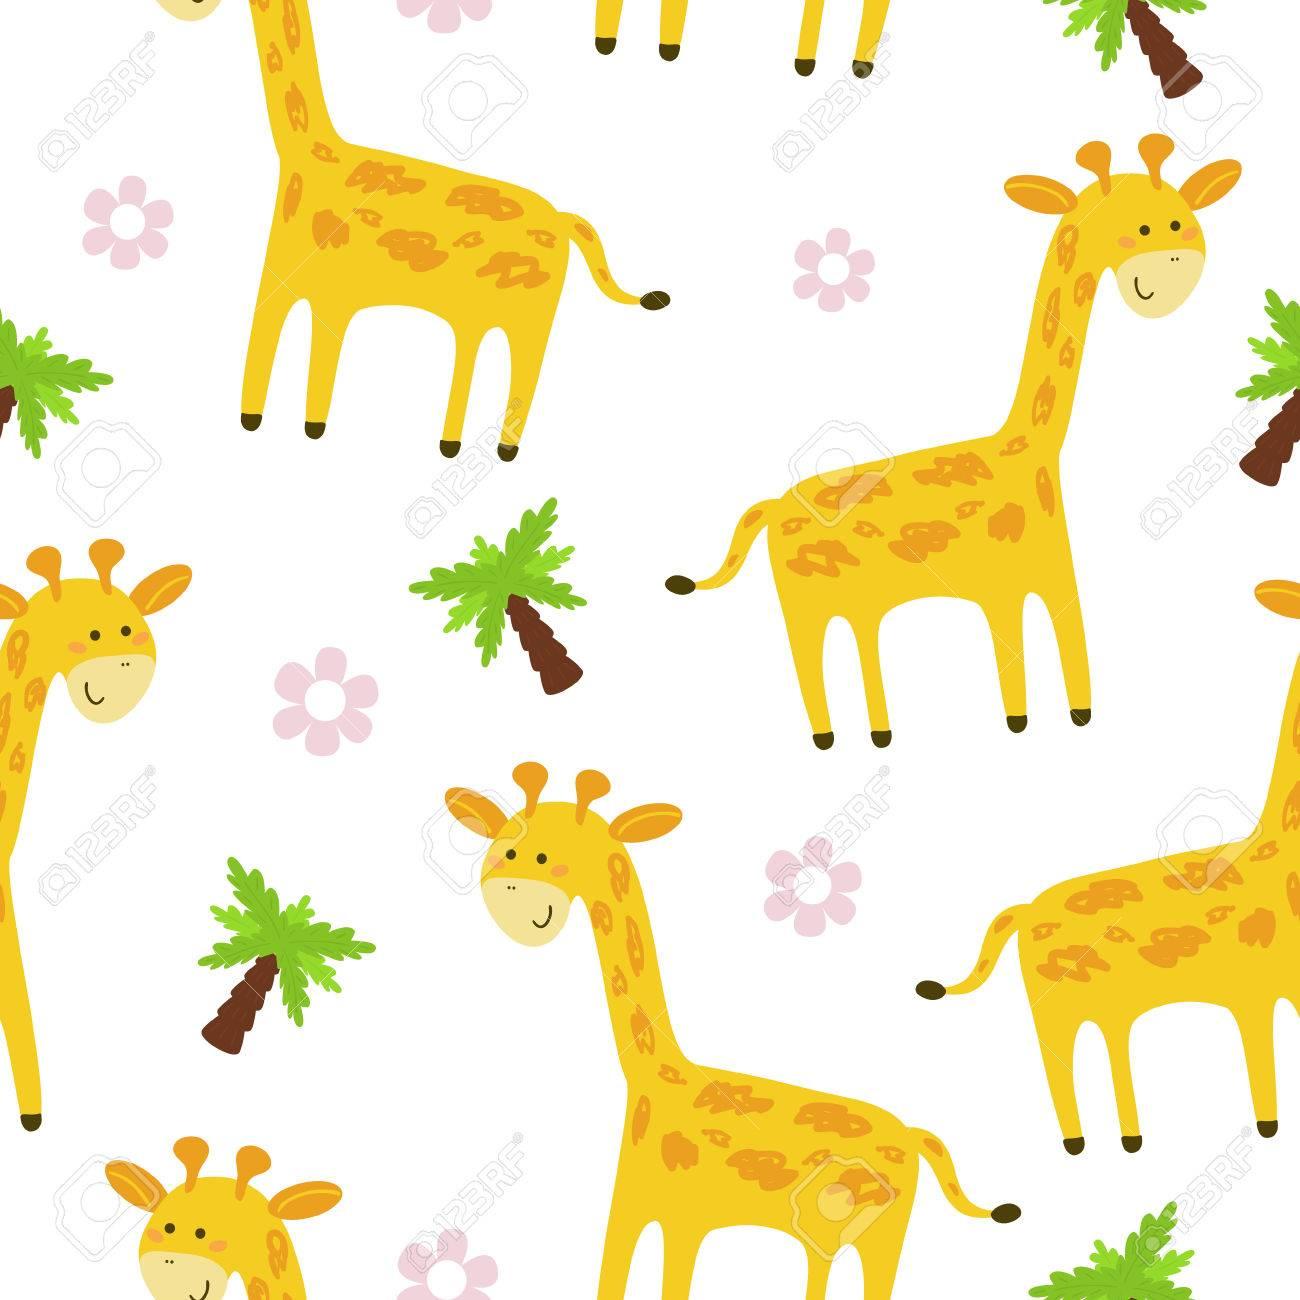 cute giraffe pattern print for kids printable templates royalty